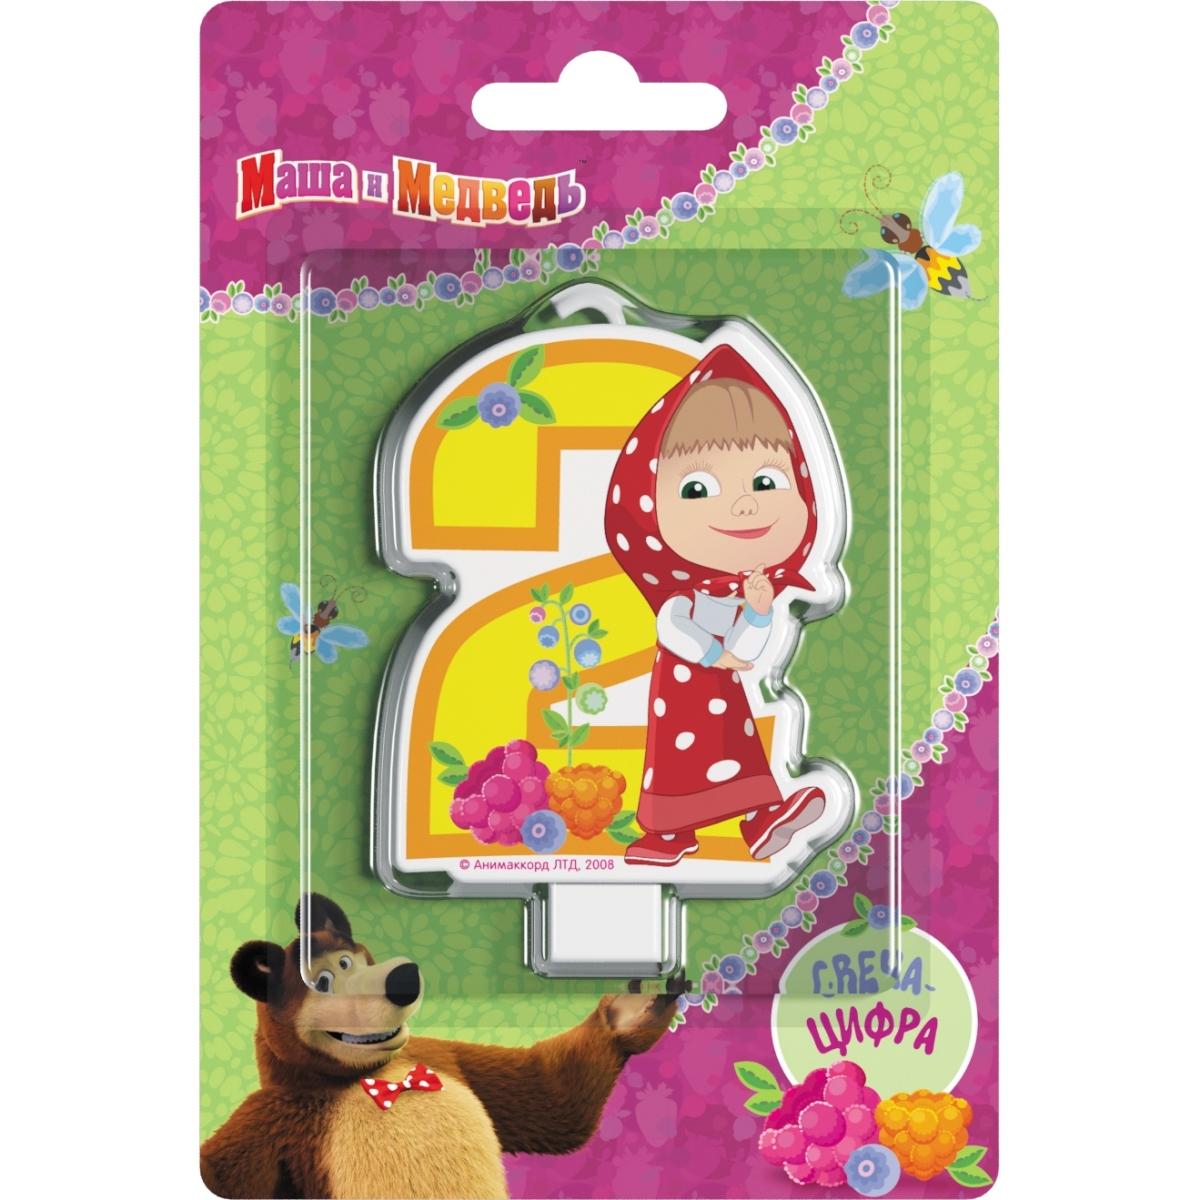 Декор Маша и Медведь Свеча Маша и Медведь «Цифра 2» кукла маша в красном сарафане маша и медведь